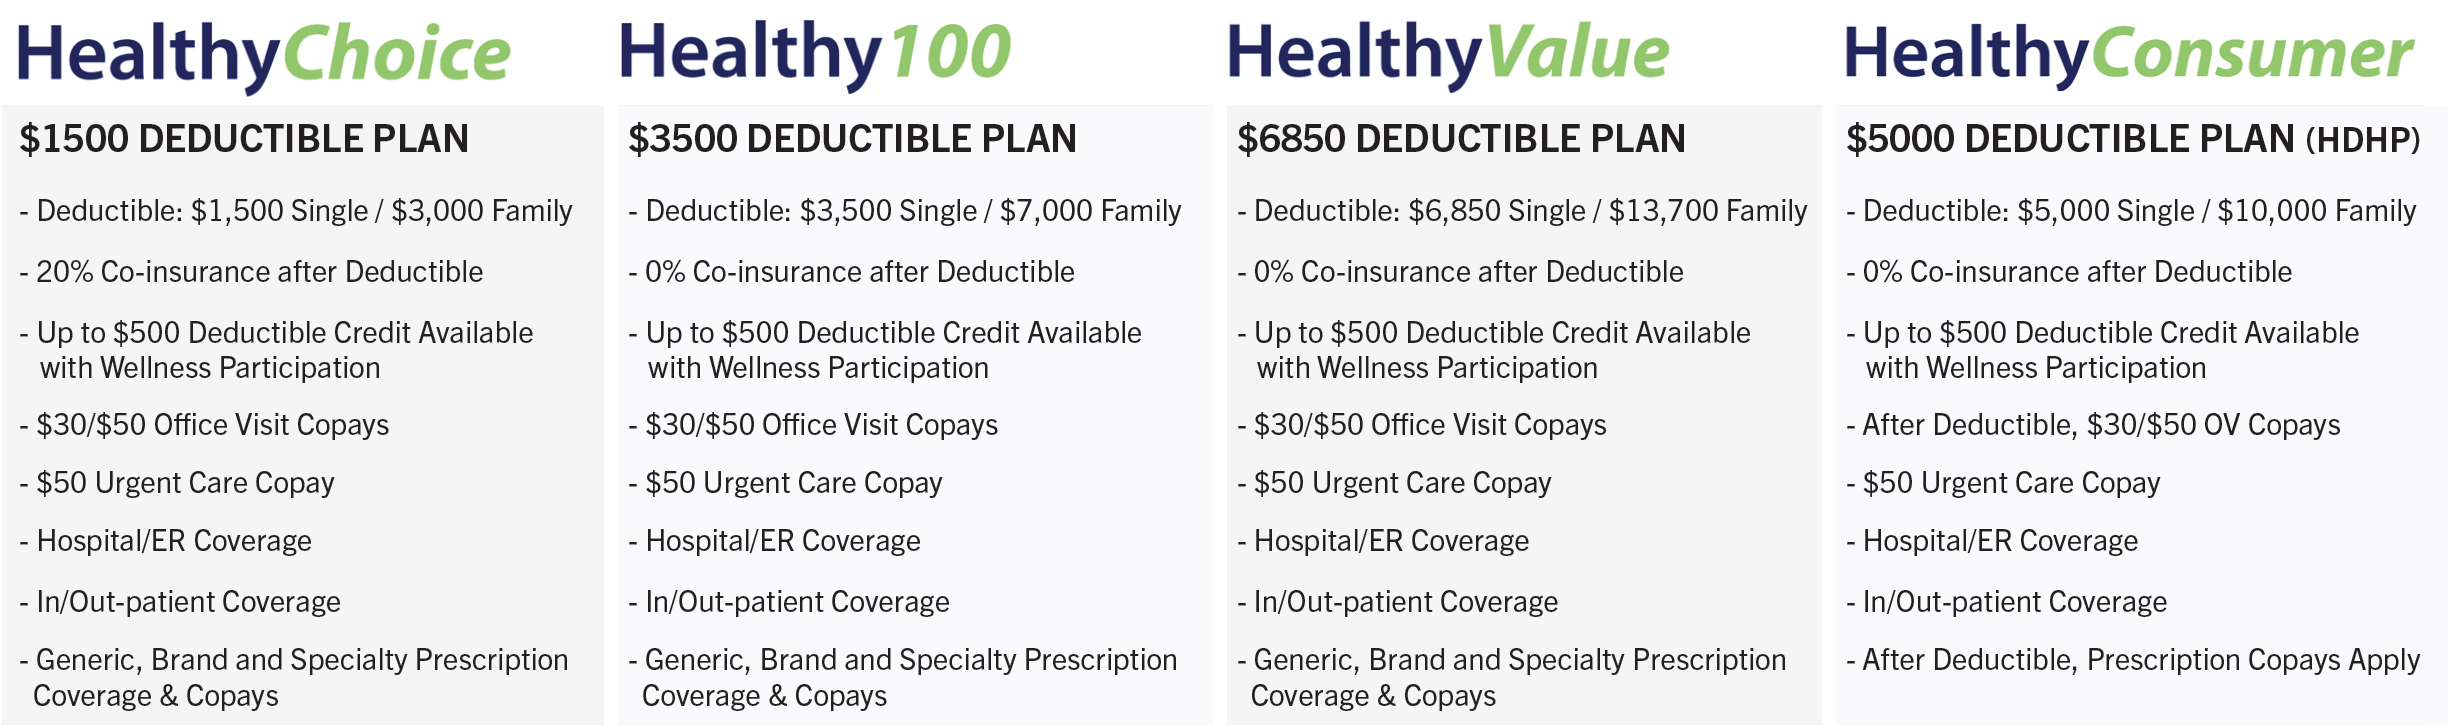 AzDA-Health-Sample-Medical-Plans.jpg